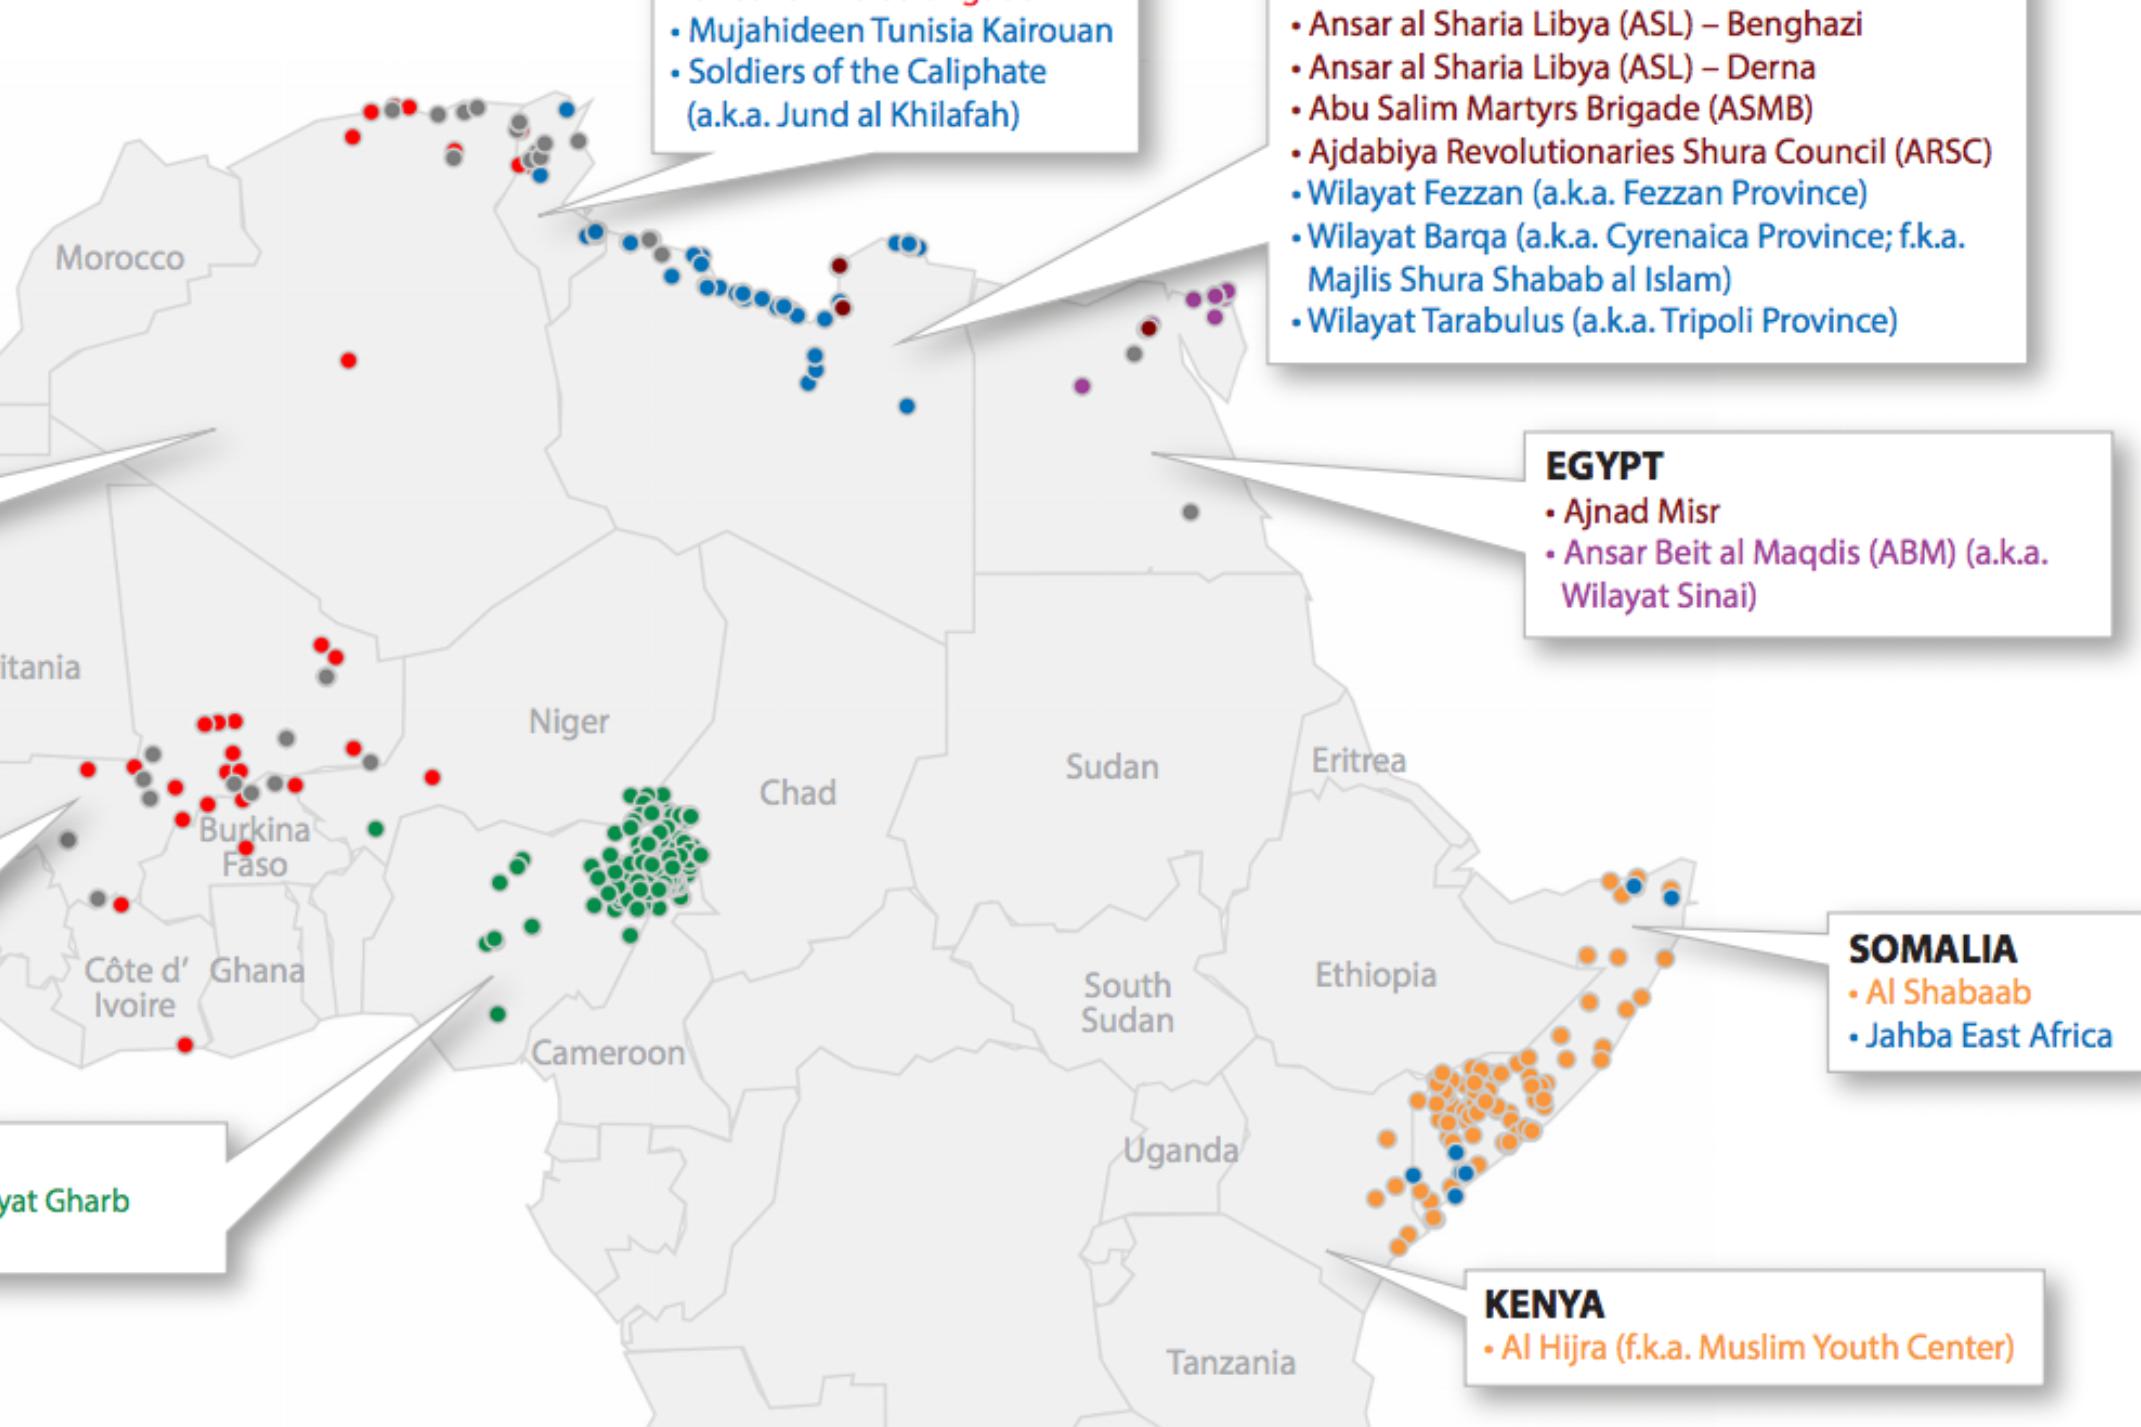 Africa's Active Militant Islamist Groups